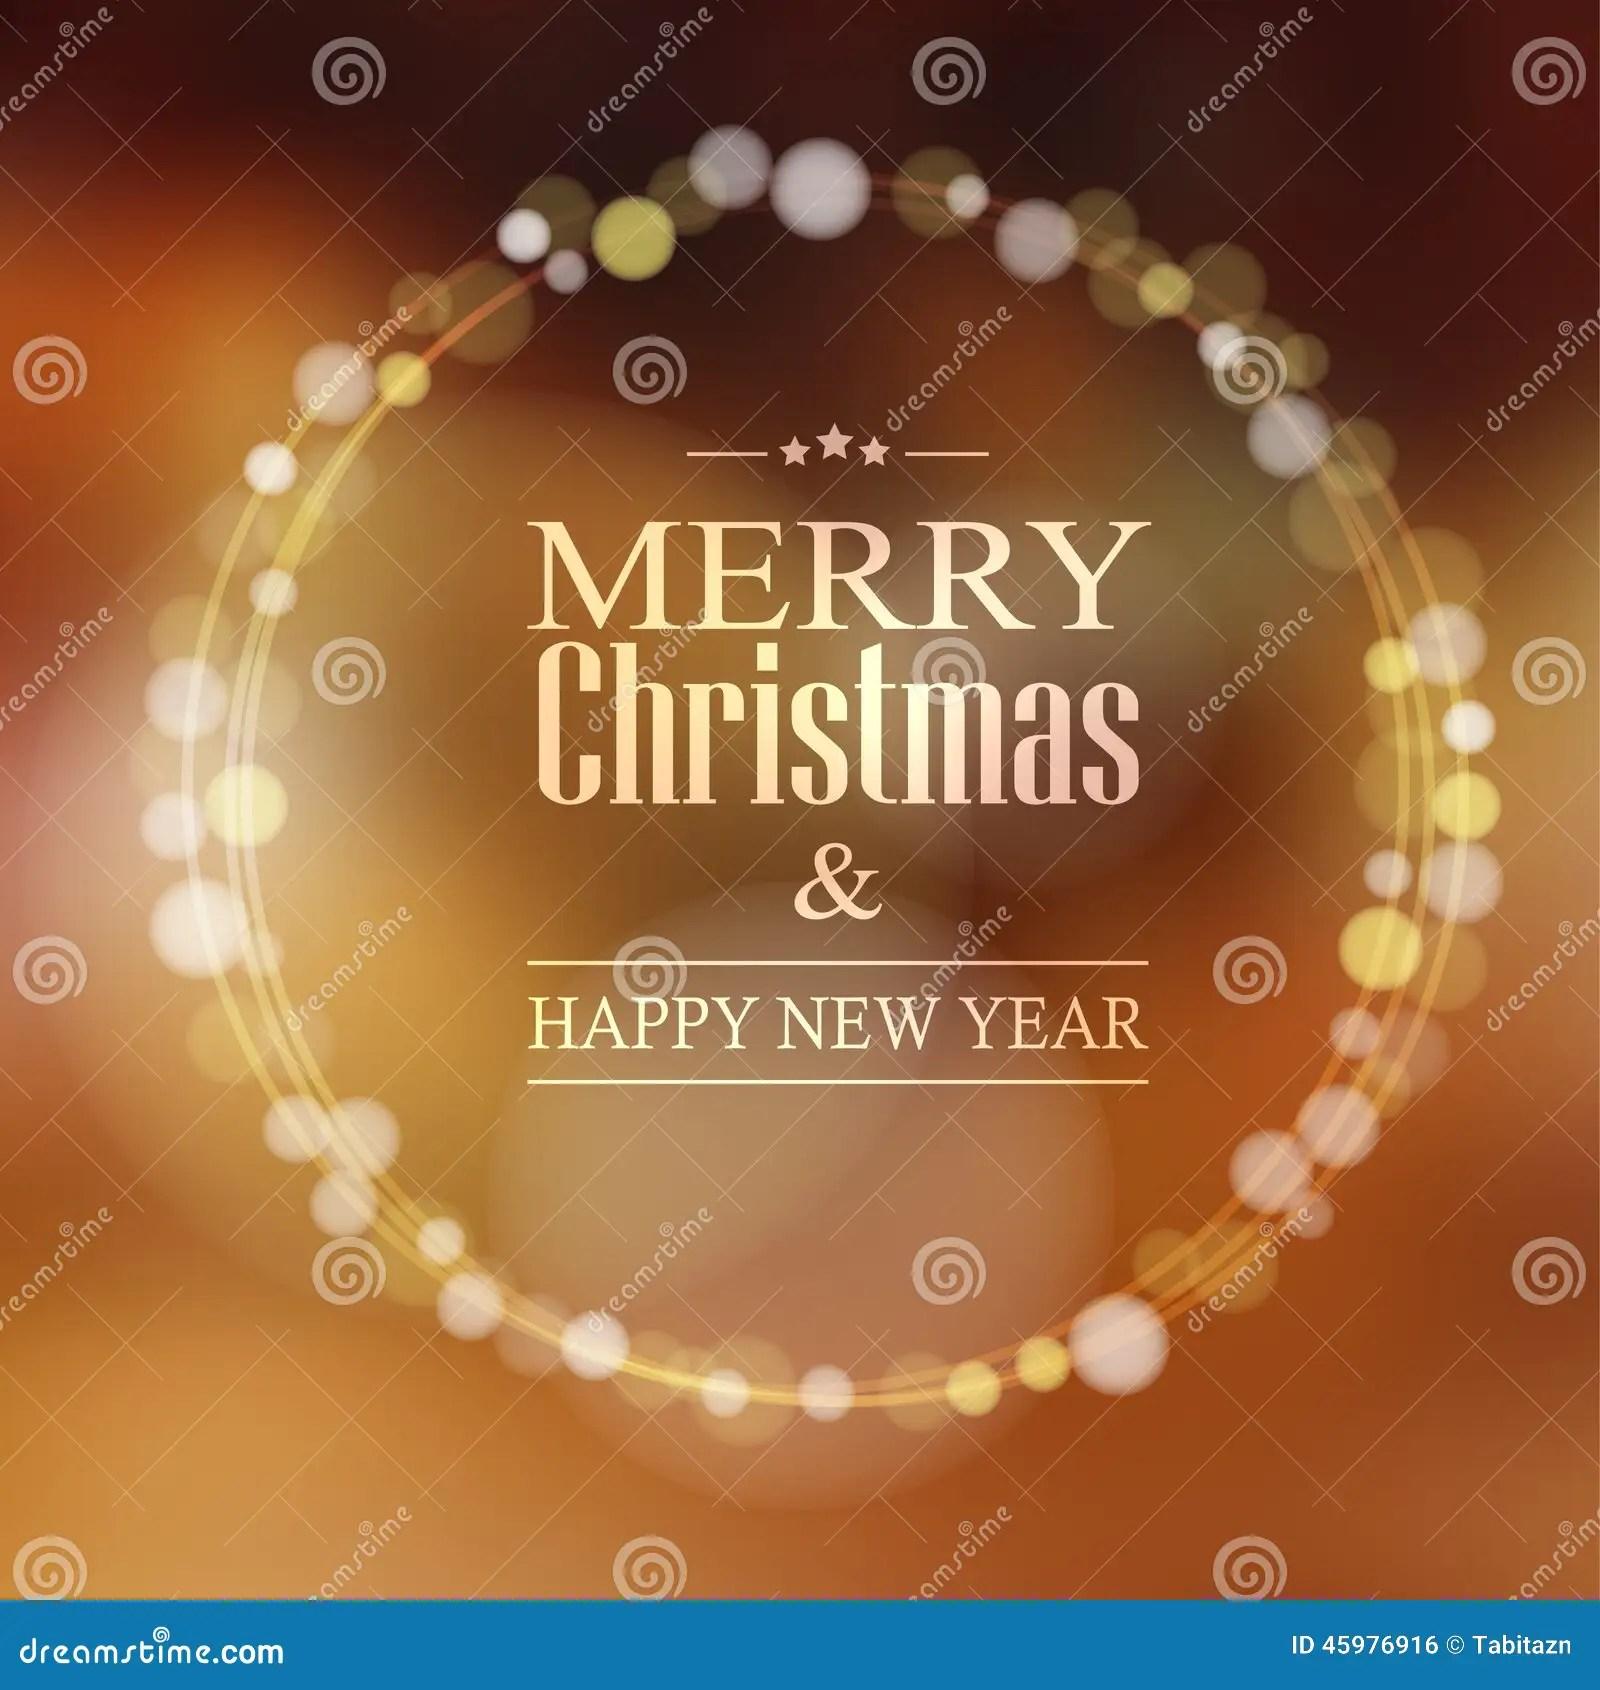 Christmas Greeting Card With Bokeh Lights Wreath Stock